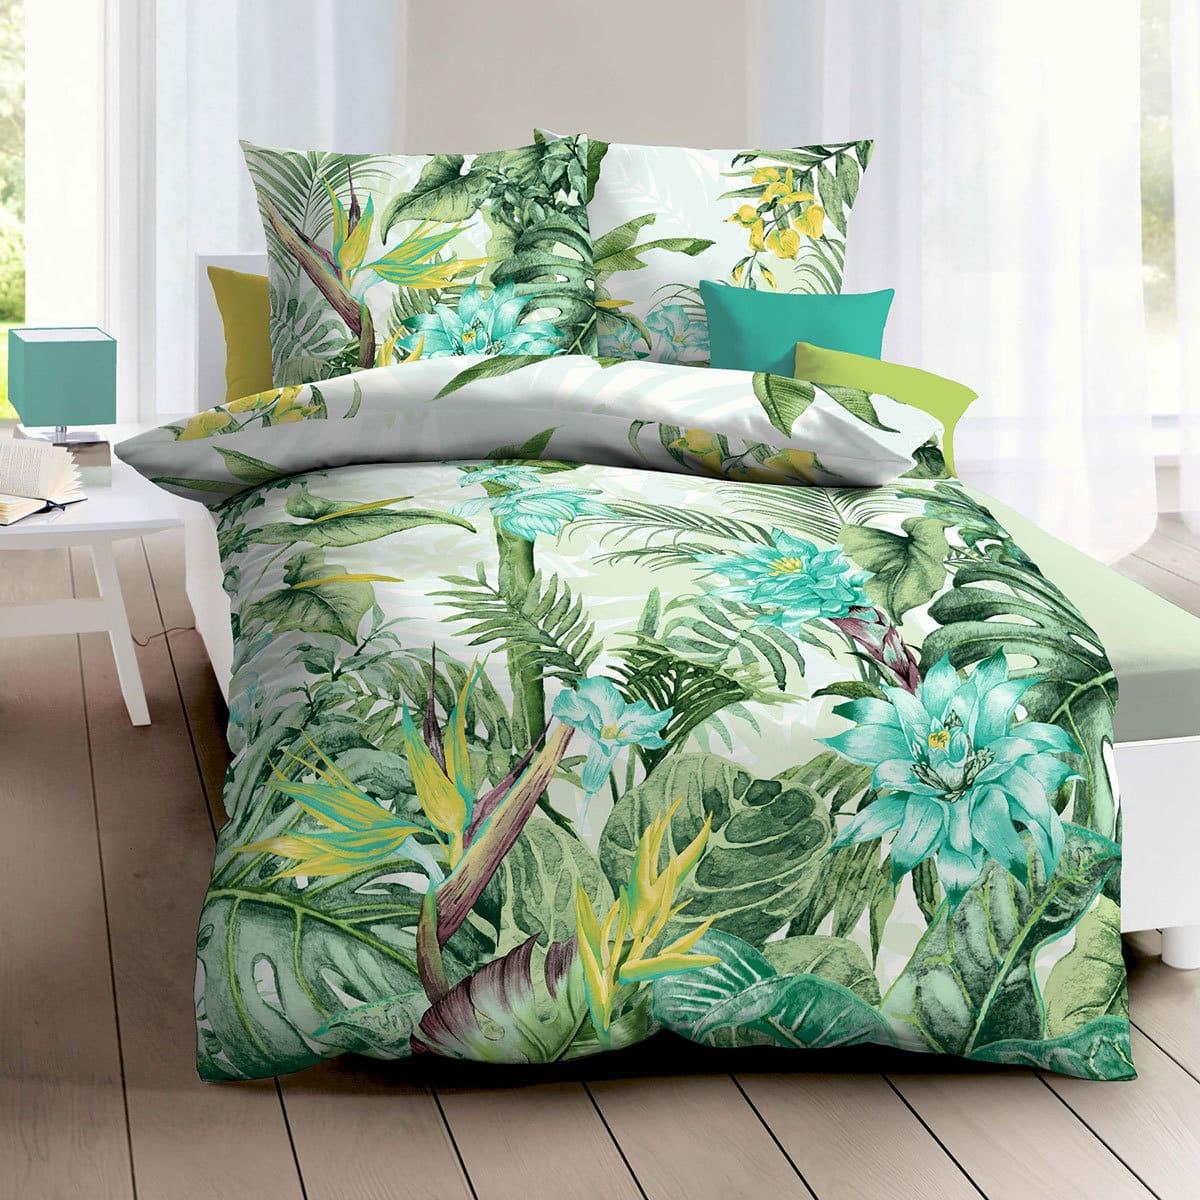 Kaeppel Mako Satin Bettwäsche Tahiti Jade Günstig Online Kaufen Bei